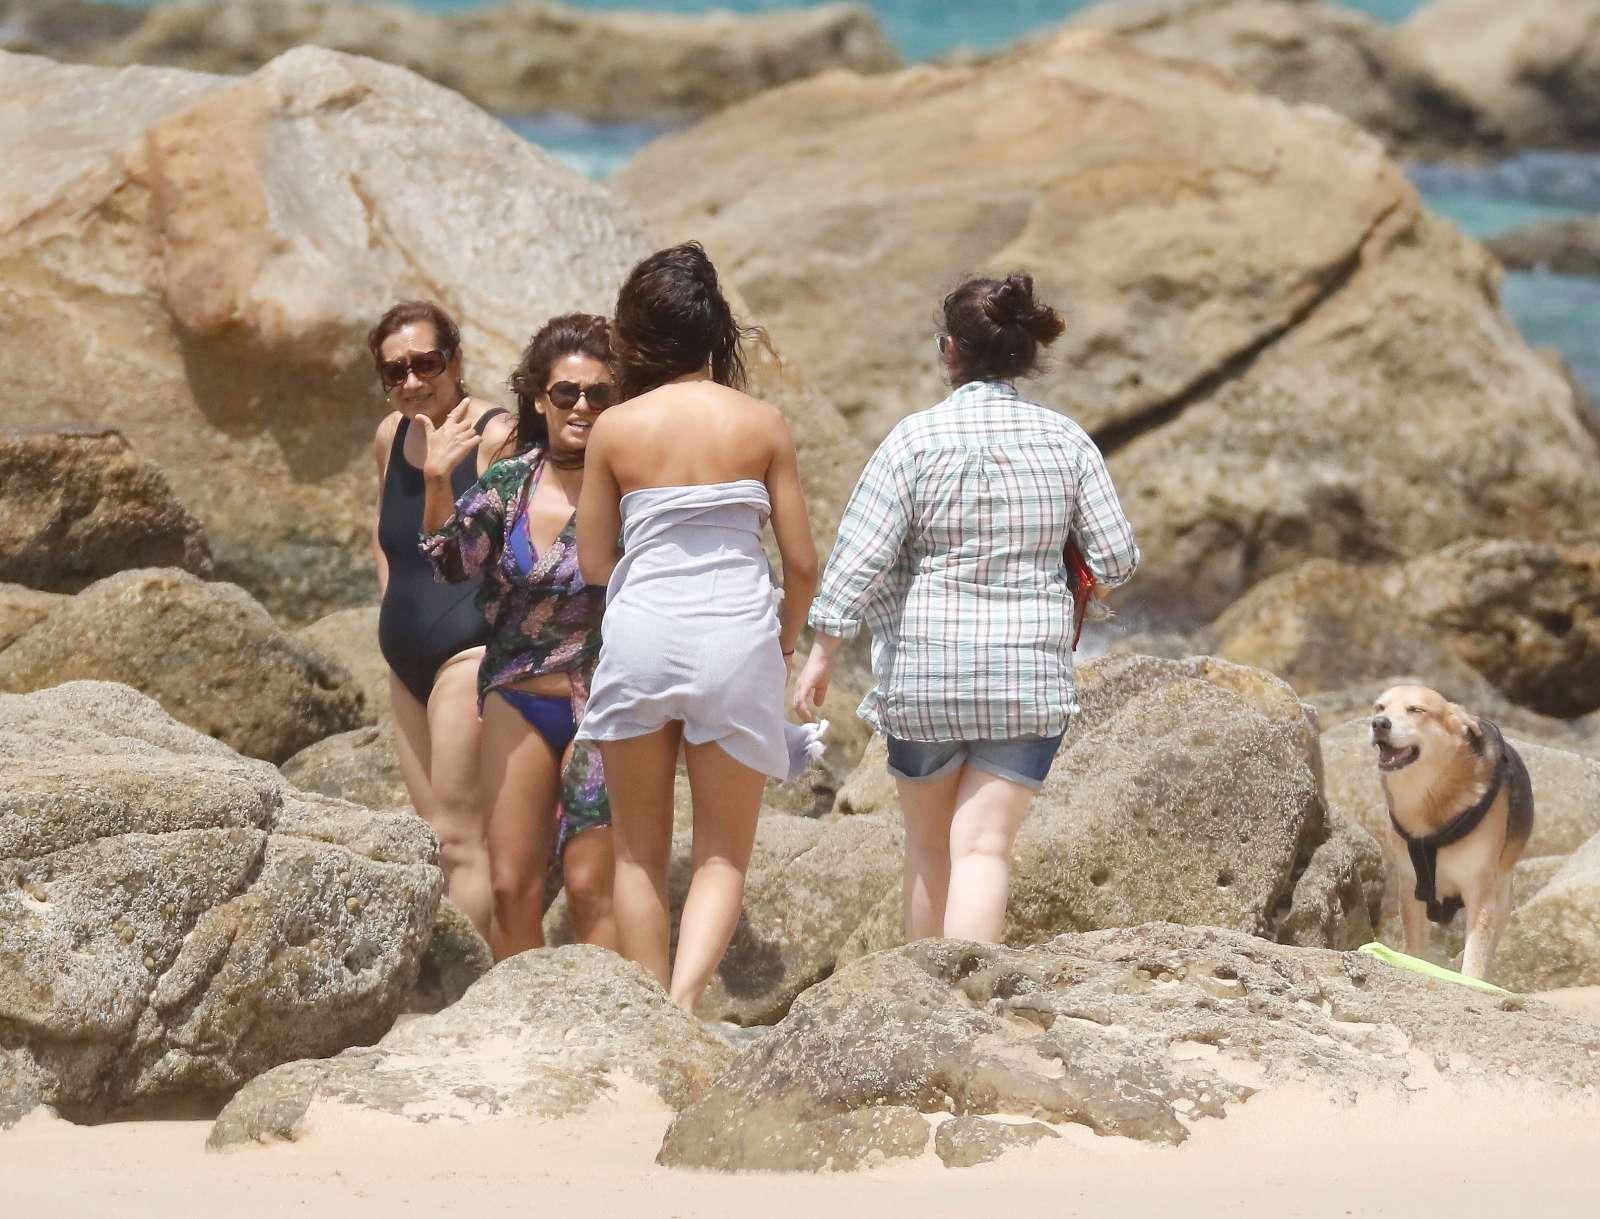 Monica Cruz 2017 : Monica Cruz in Bikini 2017 -29